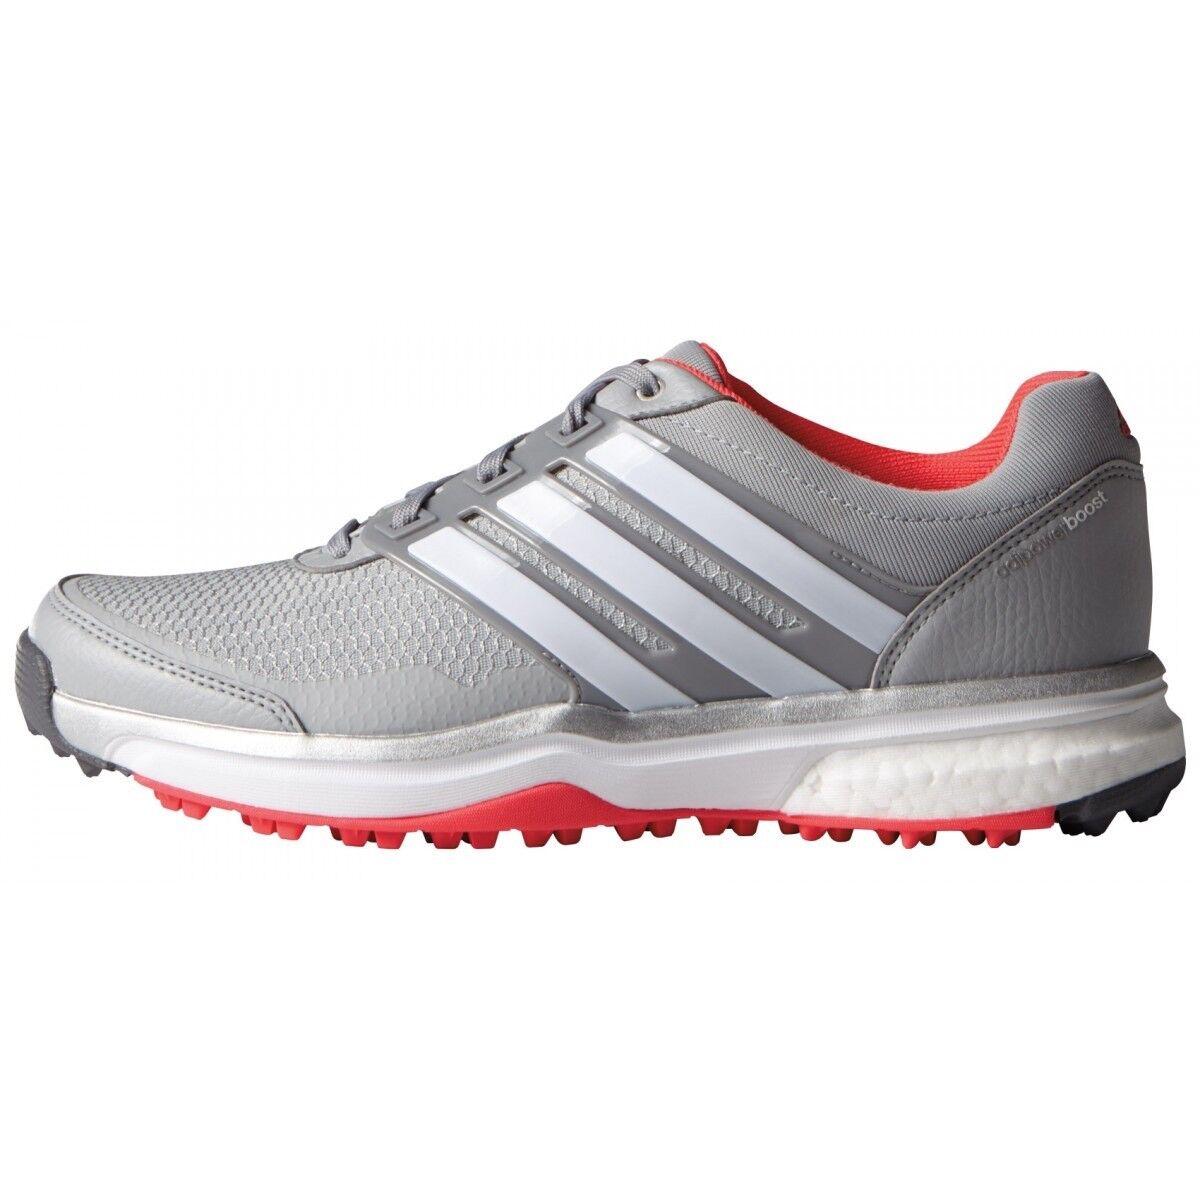 Mujer Golf Zapatos 2 adidas Adipower Sport Boost 2 Zapatos Medium 9.5 Gris ddc90e